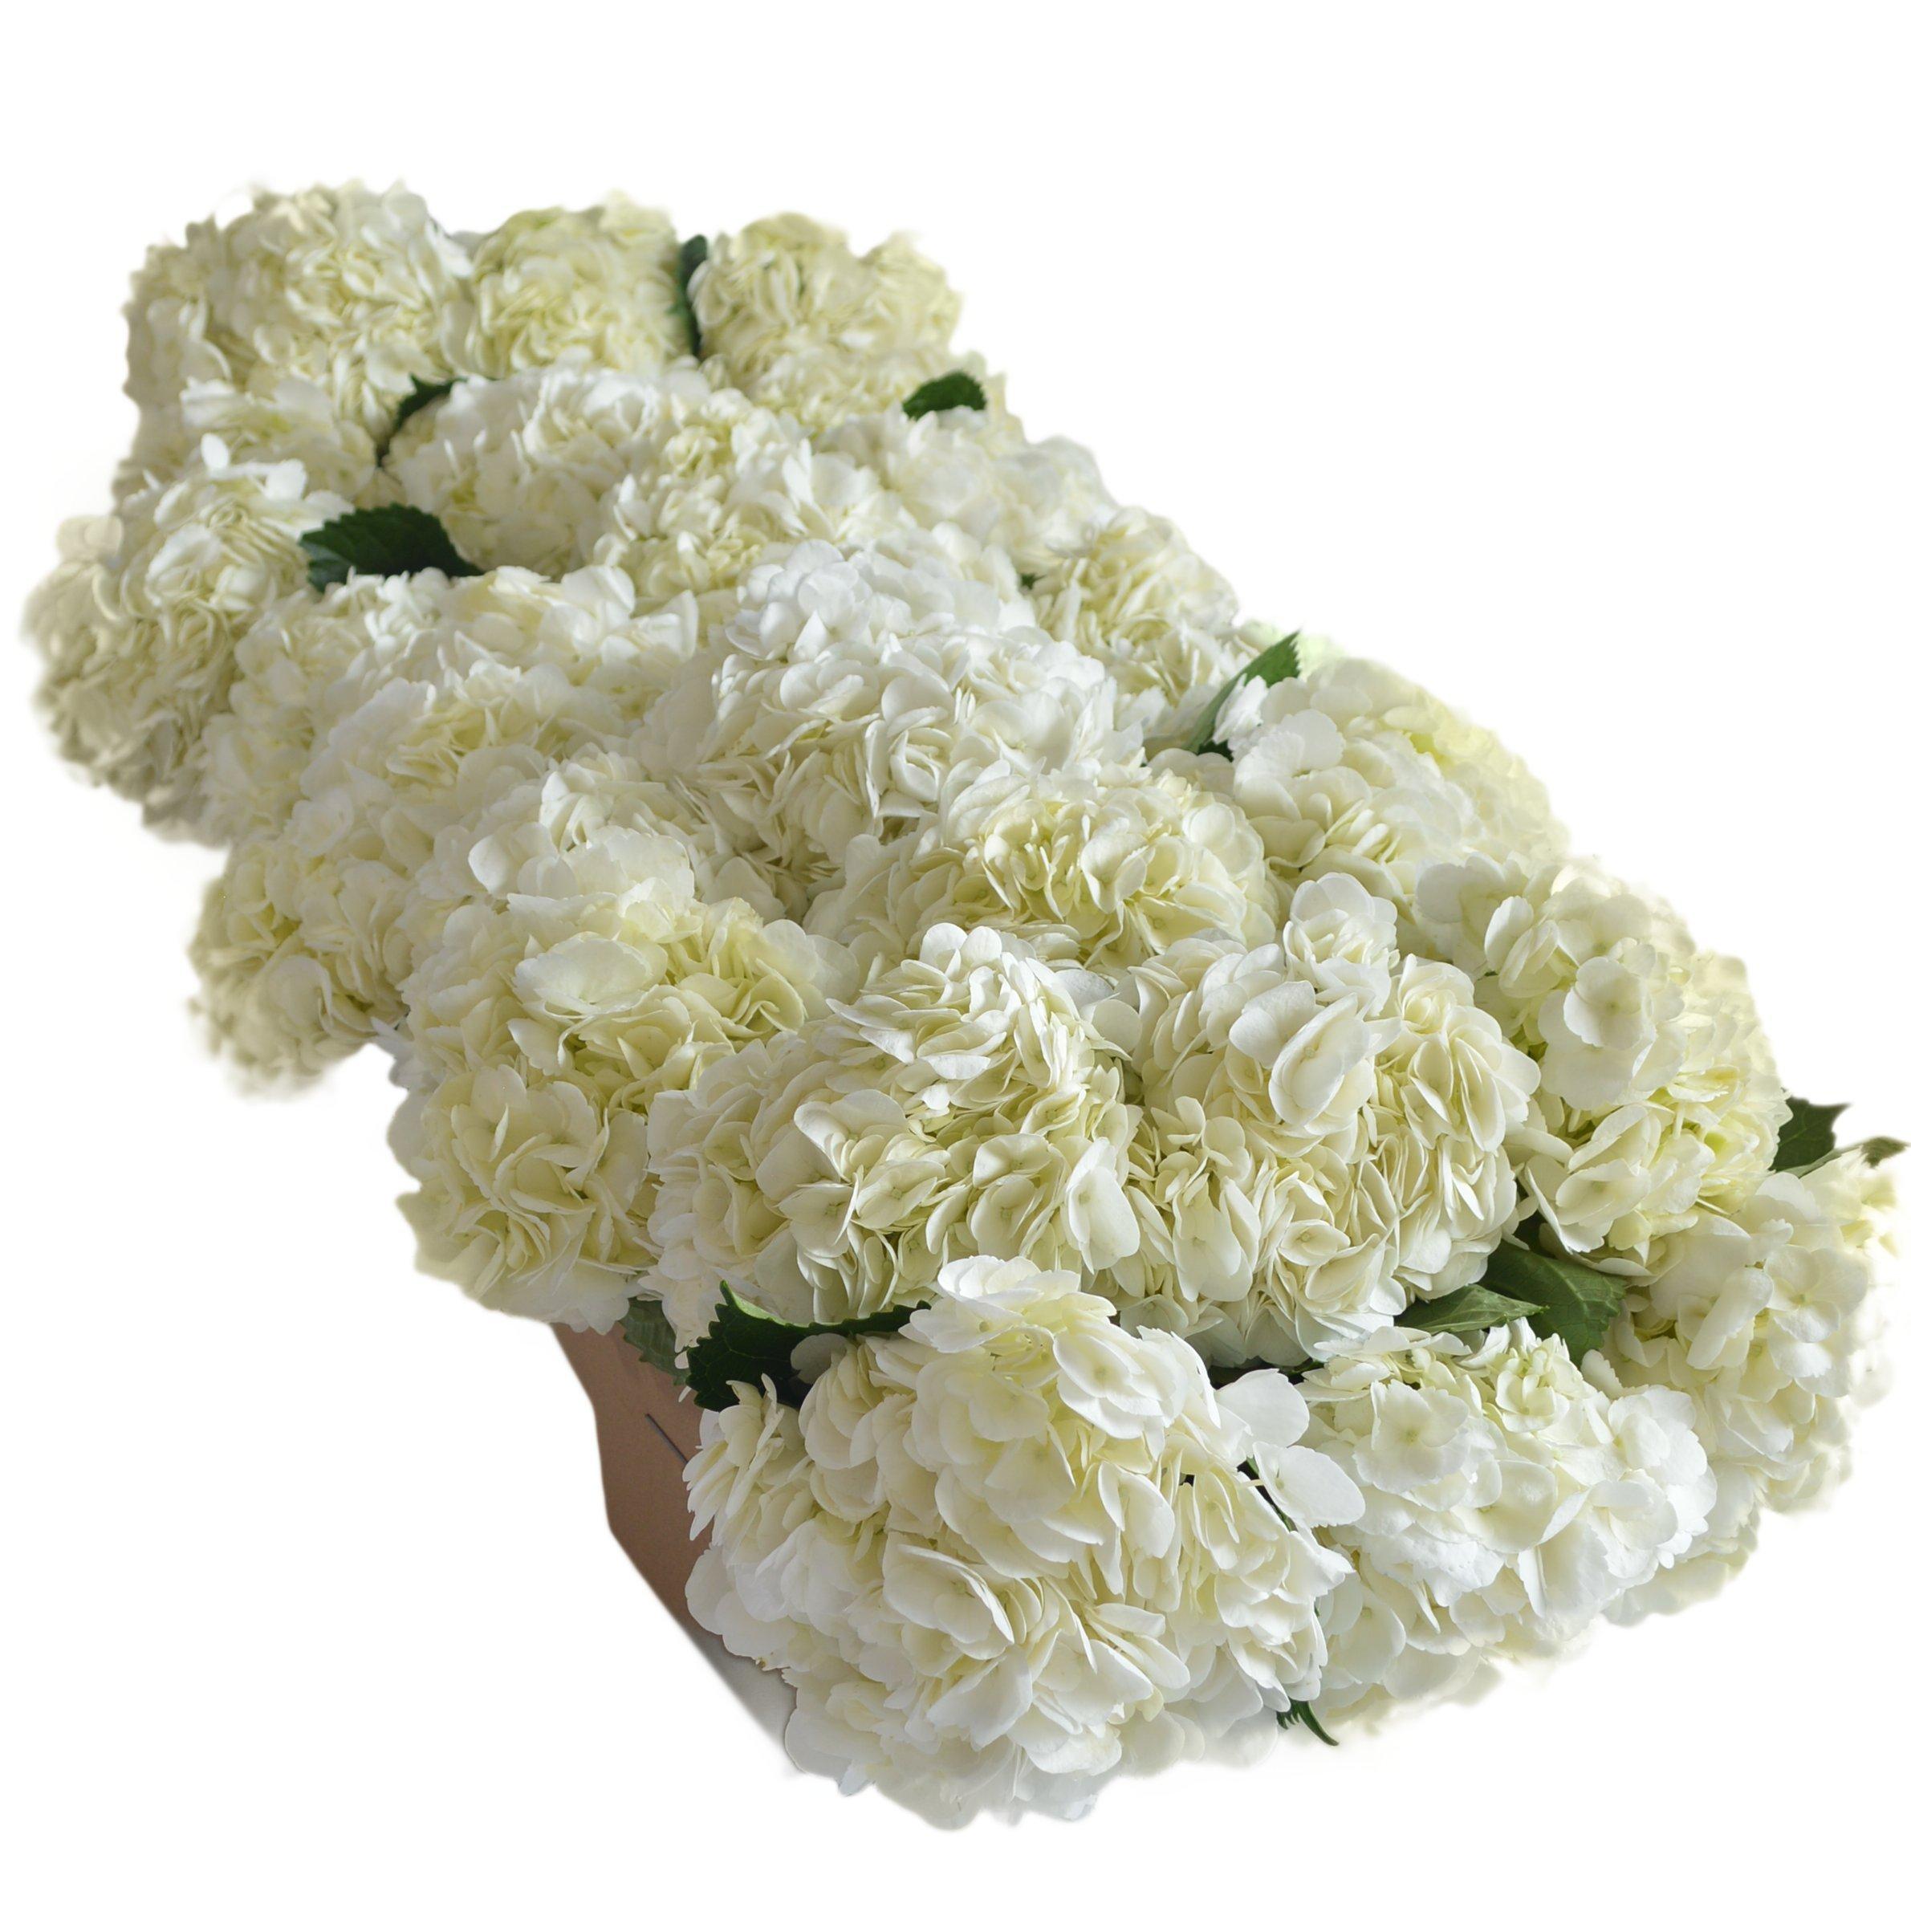 Amazon Farm2door Wholesale Roses 100 Fresh White Roses Long